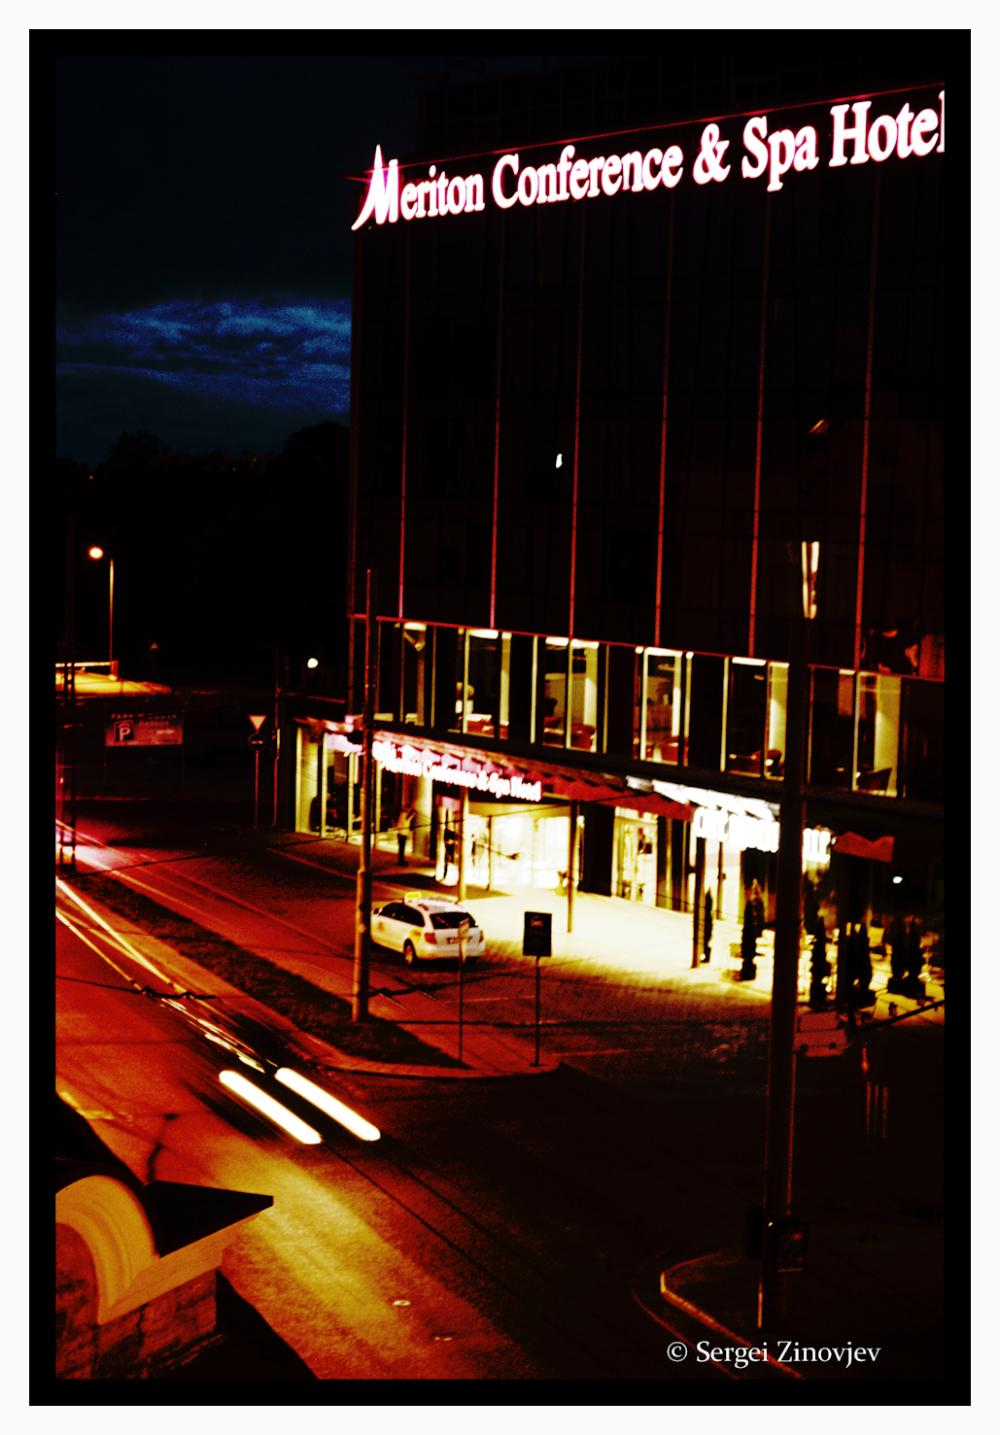 hotel in Tallinn at night